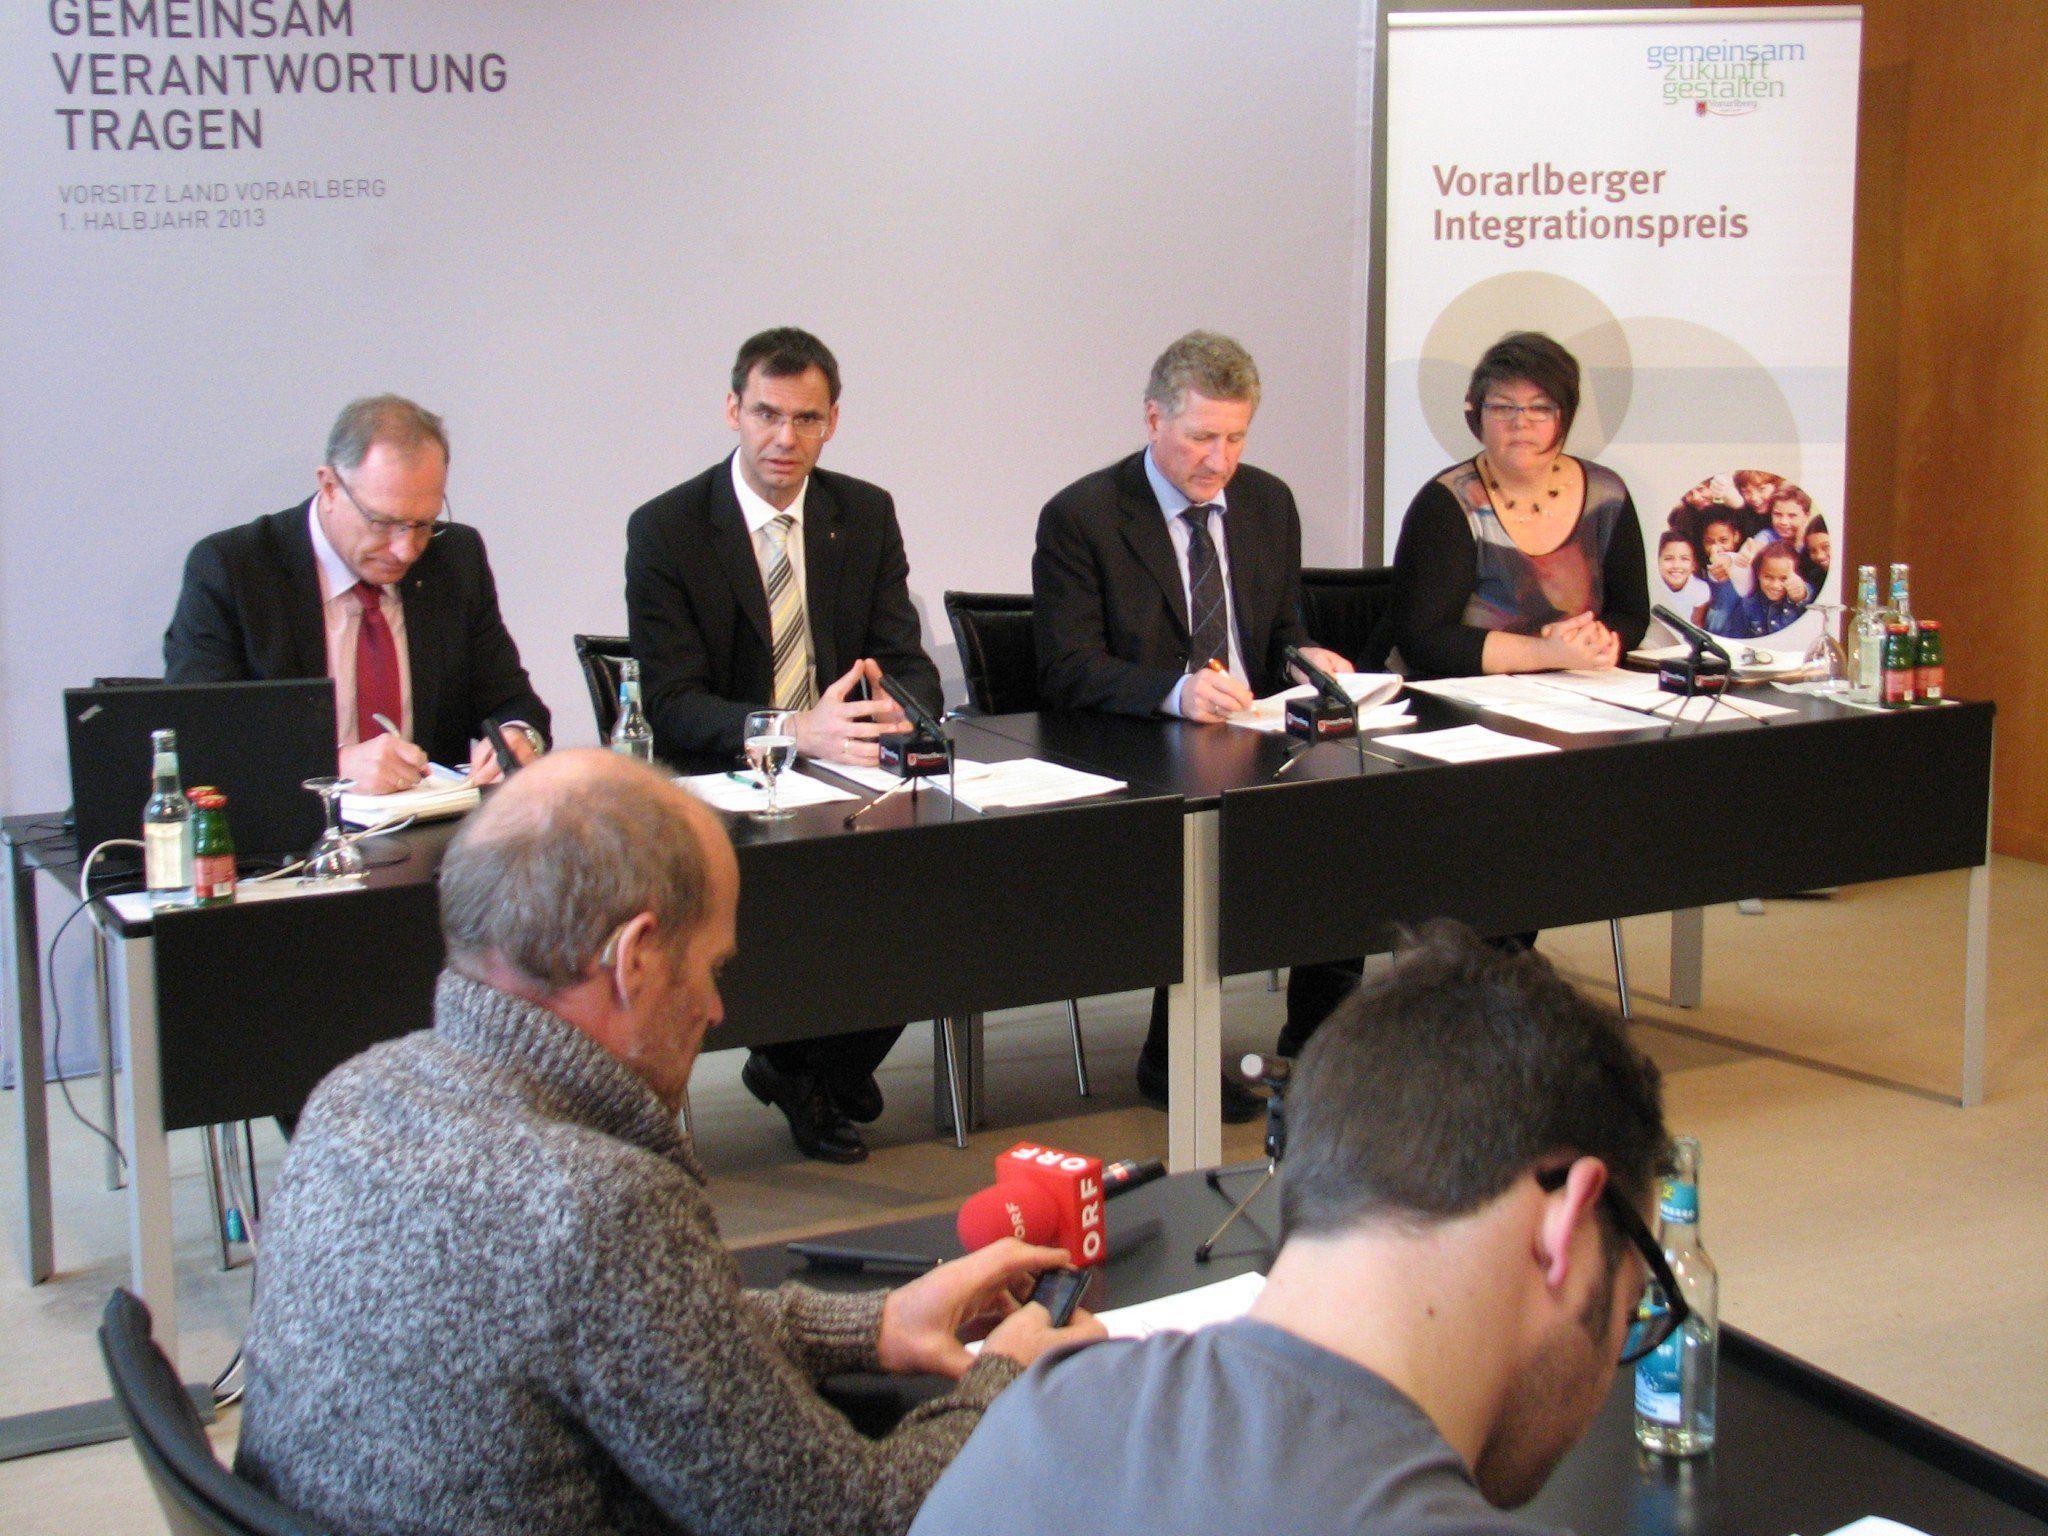 LR Wallner, LR Schwärzler und Integrationskoordinatorin Carmen Nardelli zum Vorarlberger Integrationspreis 2013.